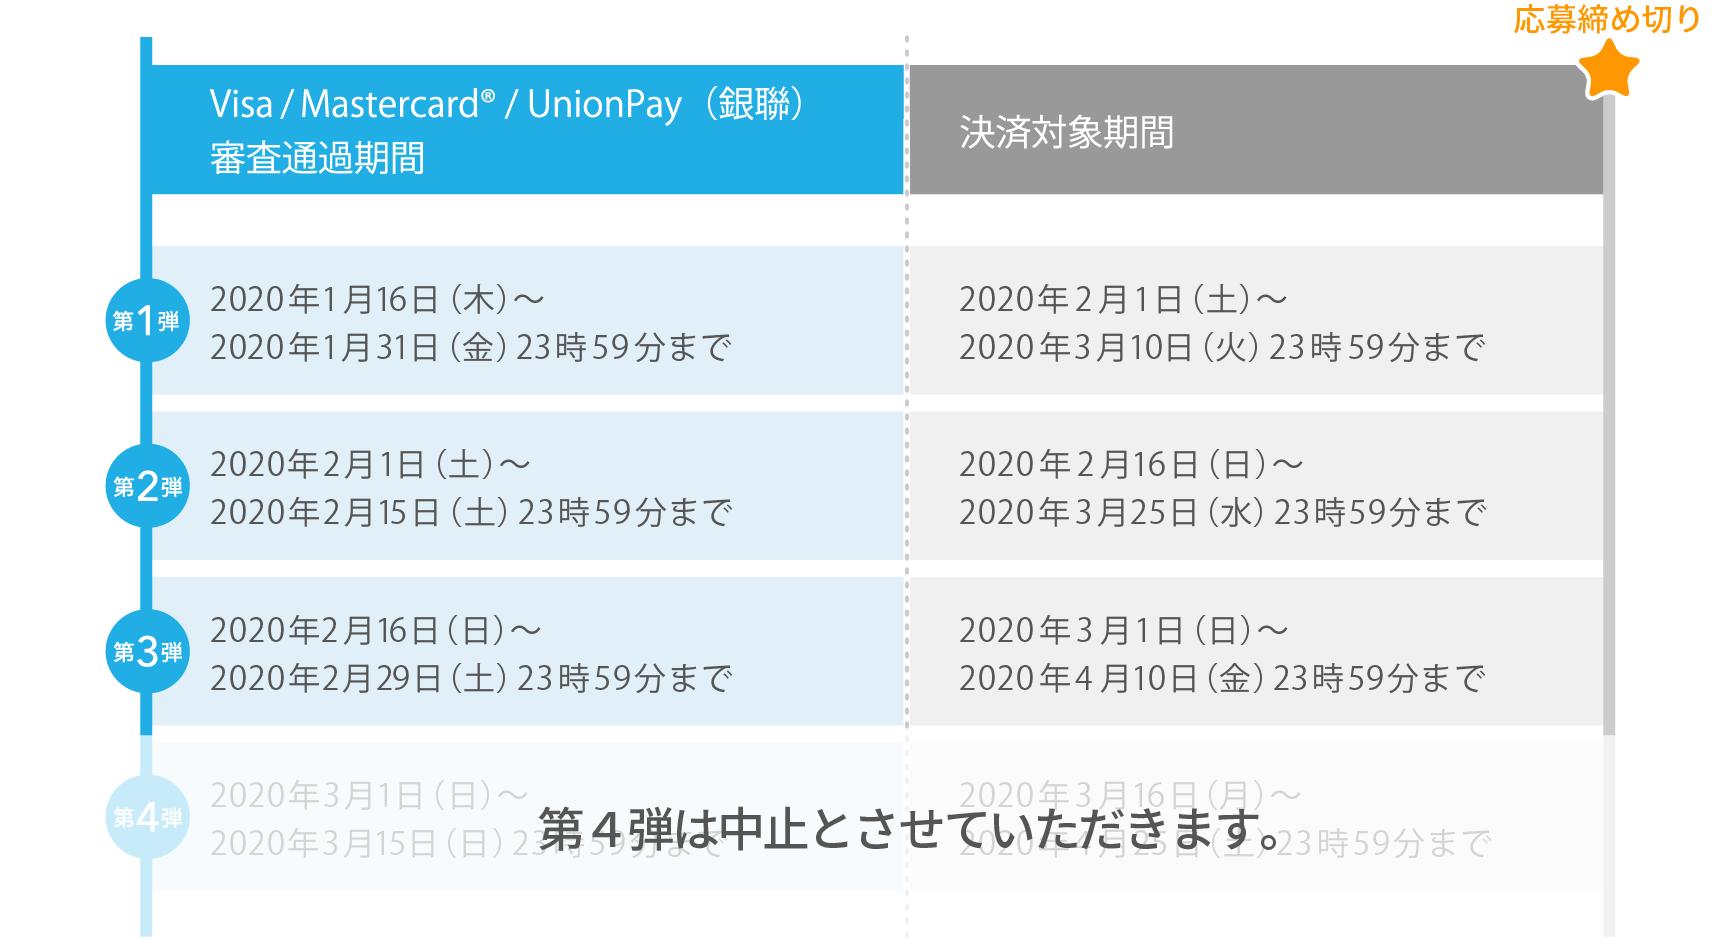 Visa/Mastercard®/UnionPay(銀聯) 審査通過期間 決済対象期間